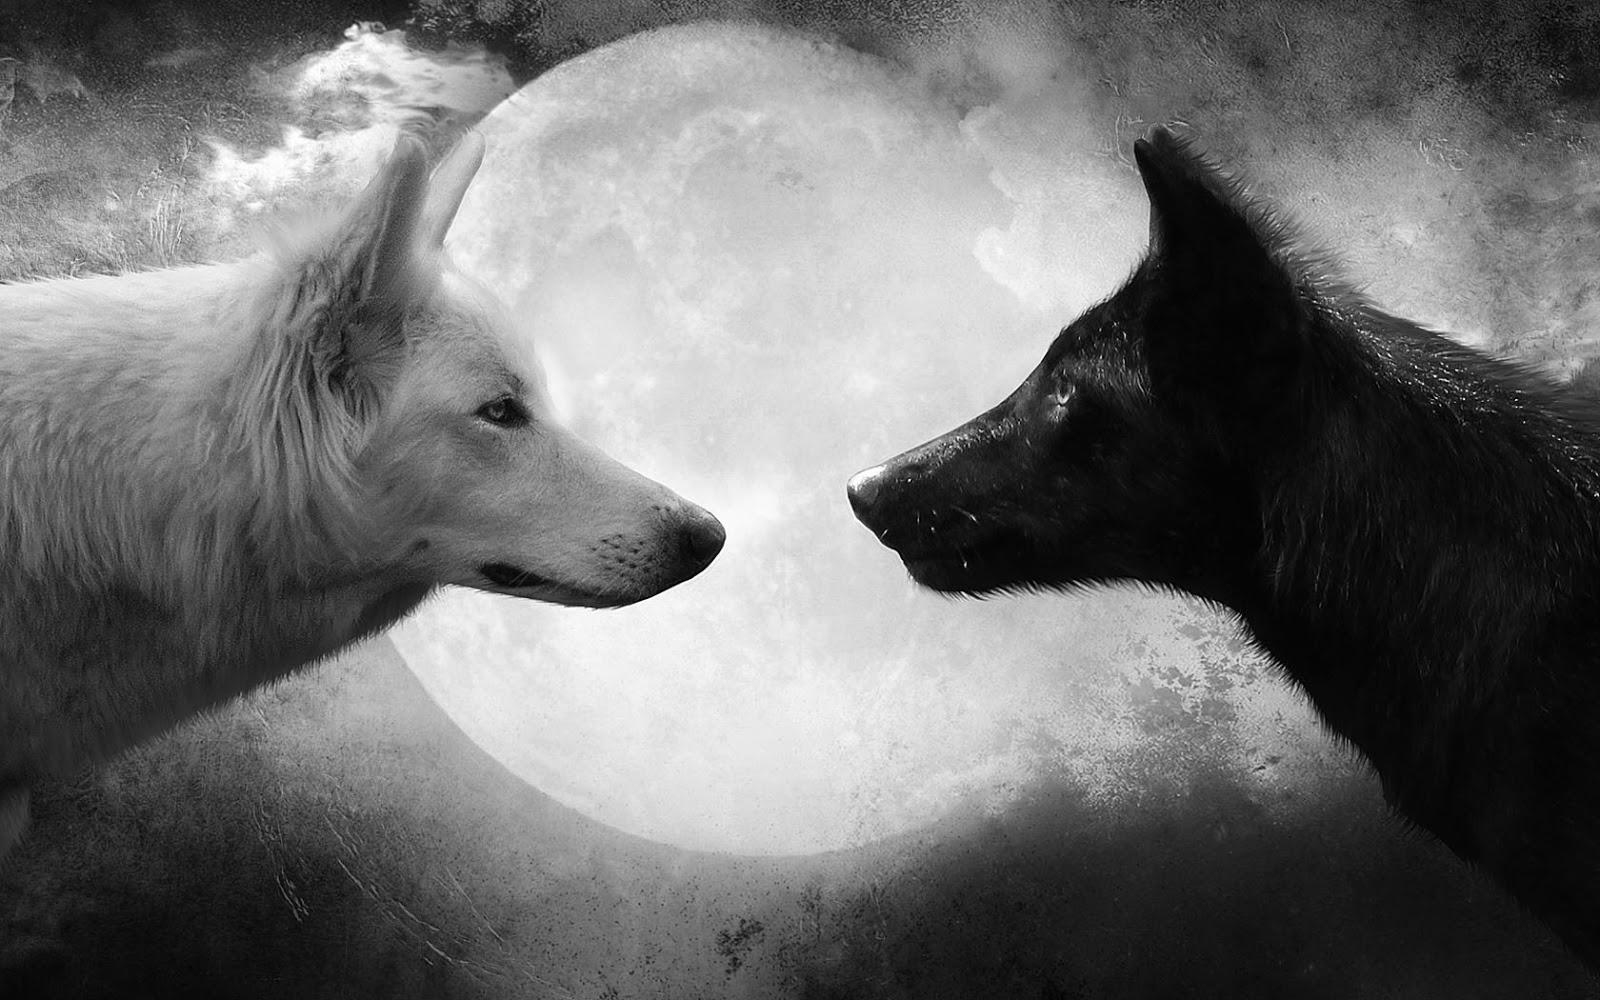 http://2.bp.blogspot.com/-jlBg3vtHxq8/ULDI4ASQ8mI/AAAAAAAAJsY/RkGgdOvauAs/s1600/zwart-wit-foto-van-twee-wolven-bij-volle-maan-hd-wolf-achtergrond.jpg